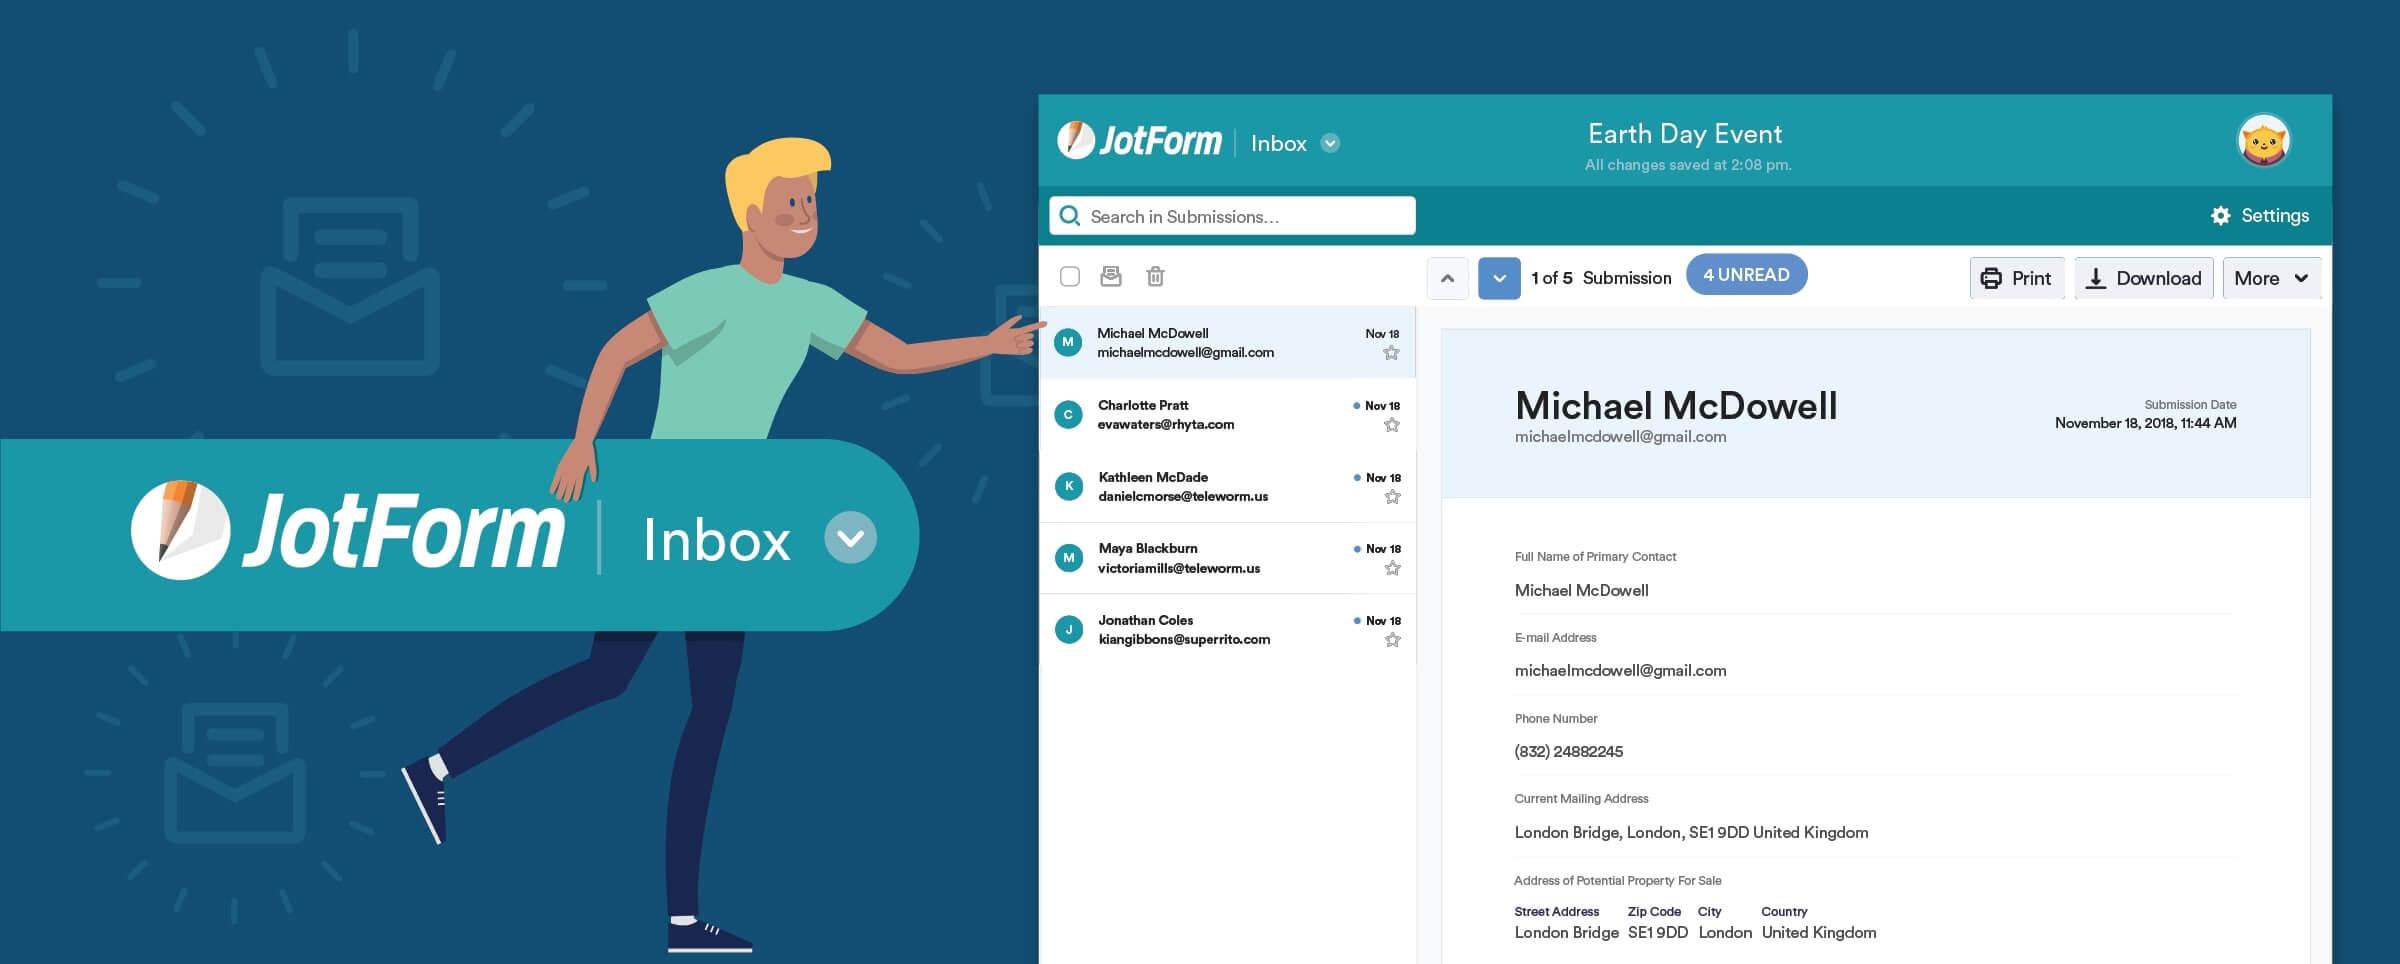 JotForm Inbox Blog Post